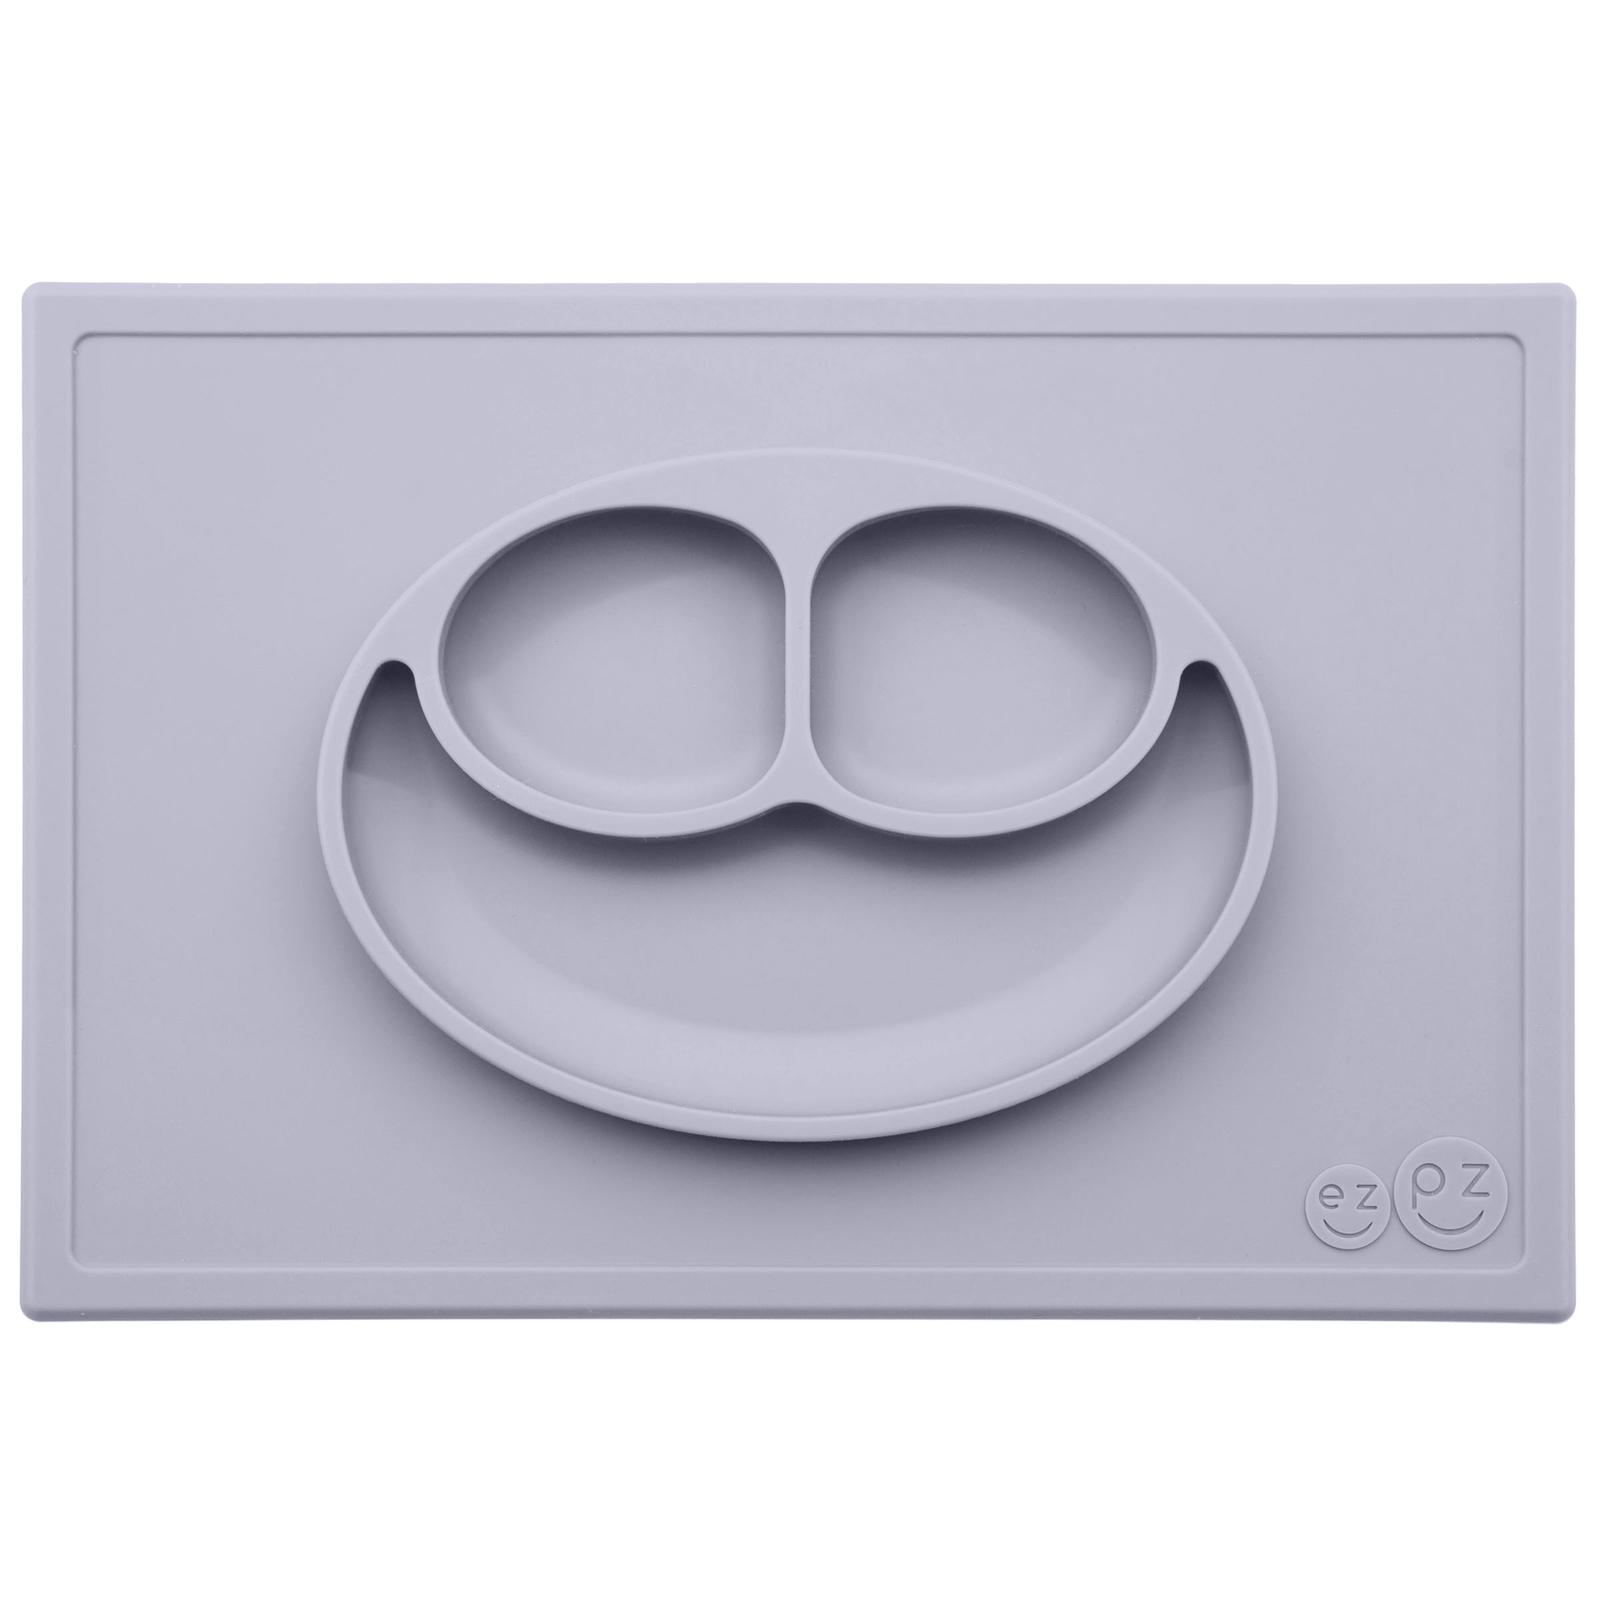 EZPZ Happy Mat - Light Grey image